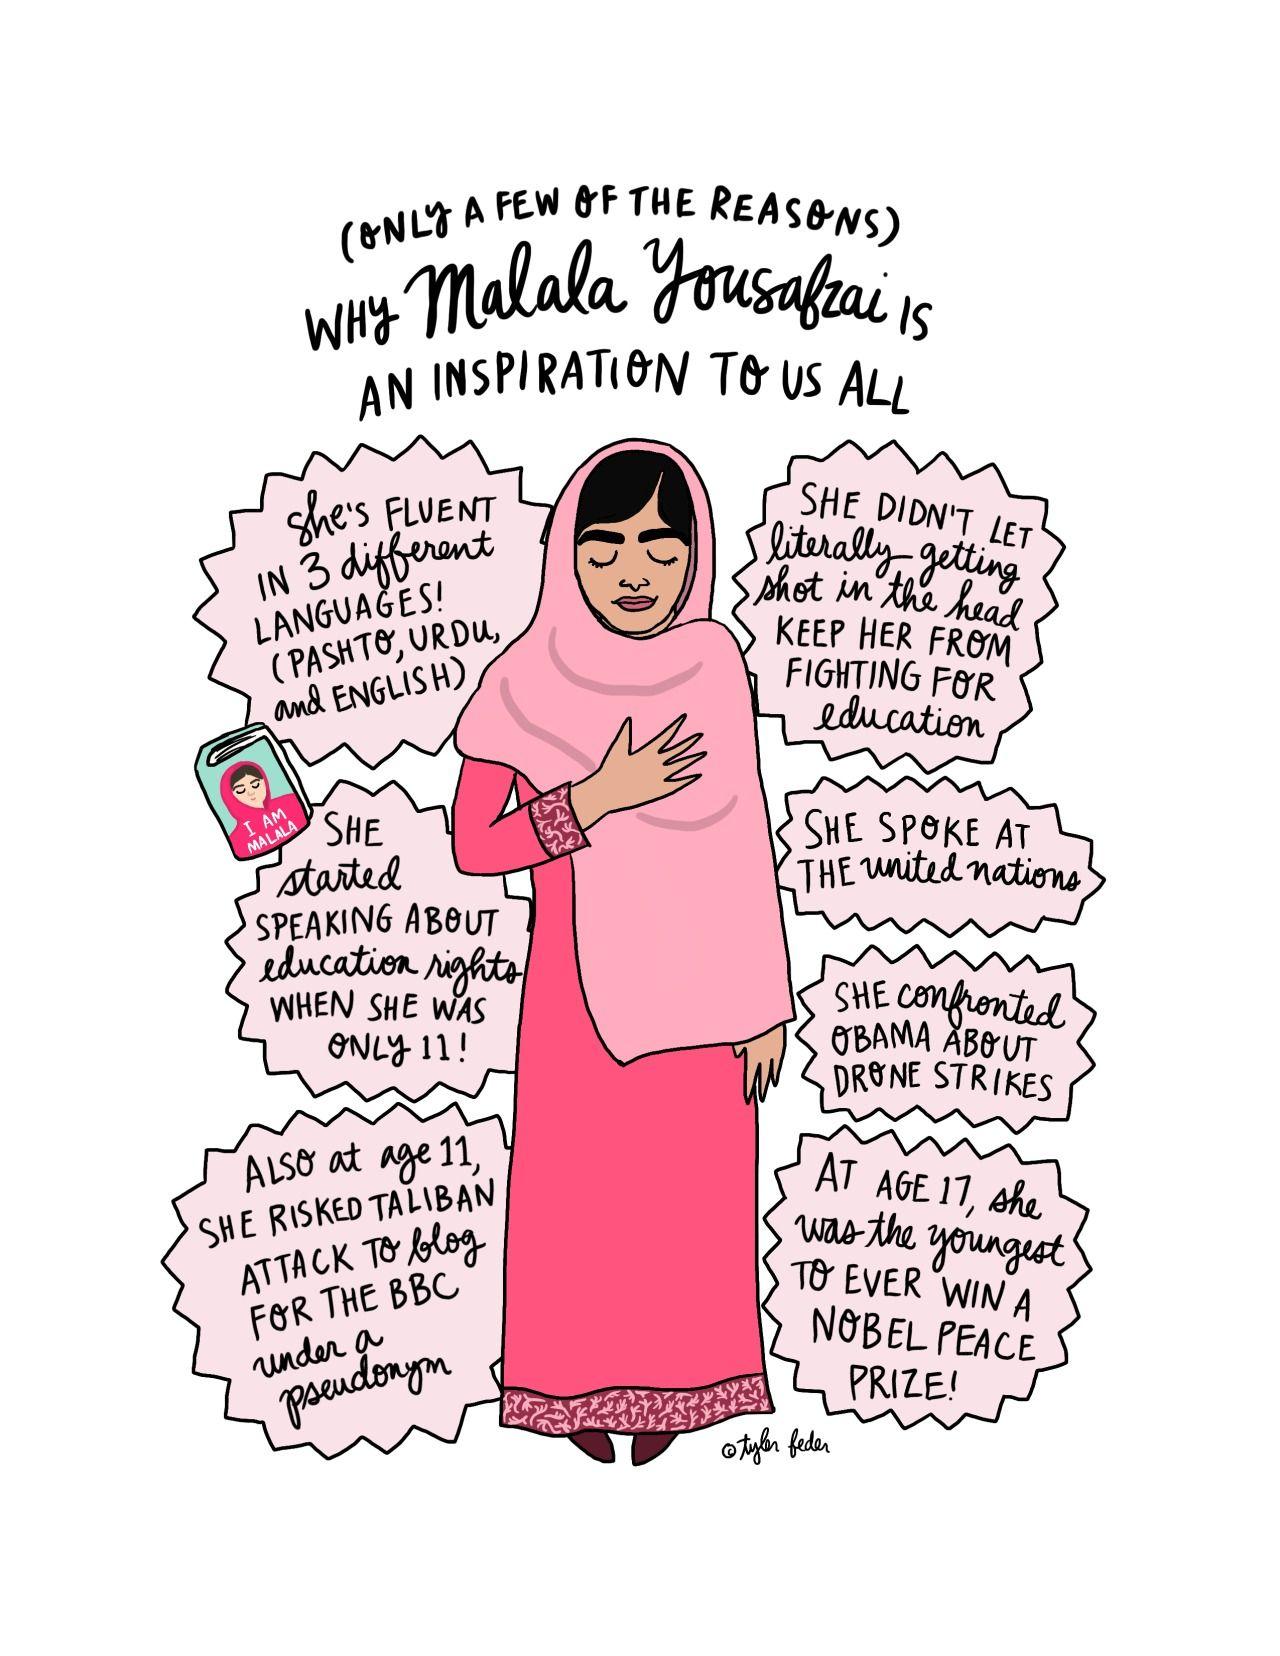 Feminist Inspirational Education Malala Yousafzai Poster Print Artwork